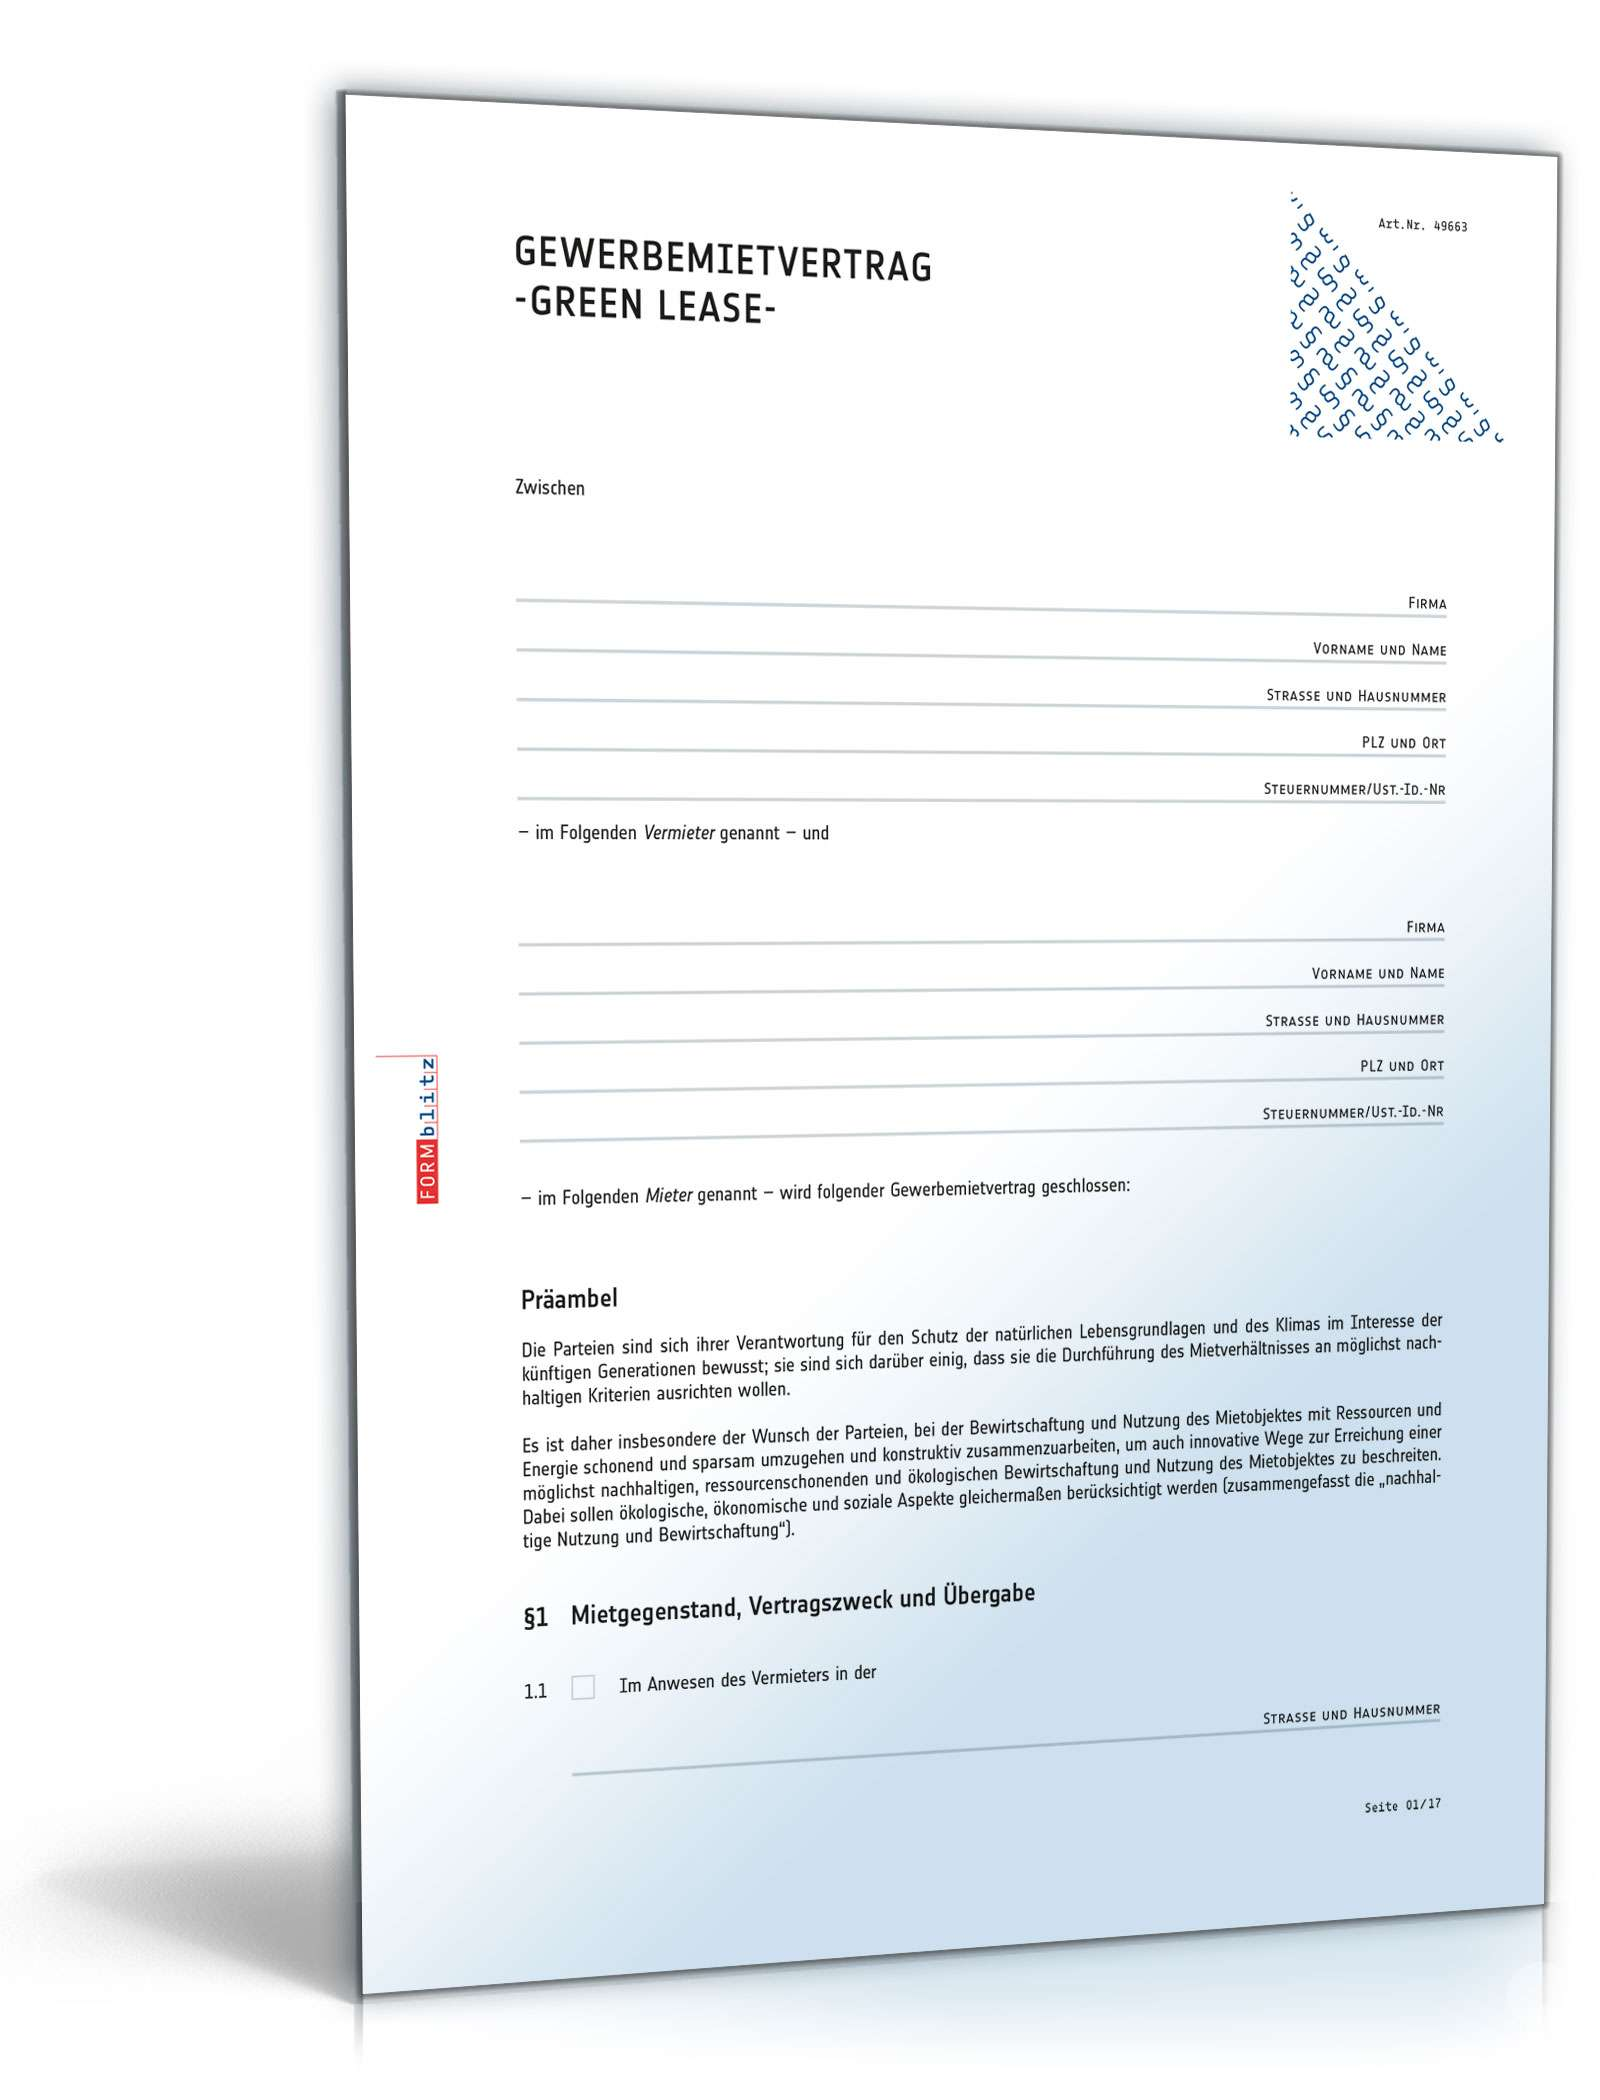 Grüner Mietvertrag Gewerbe Rechtssicheres Muster Zum Download